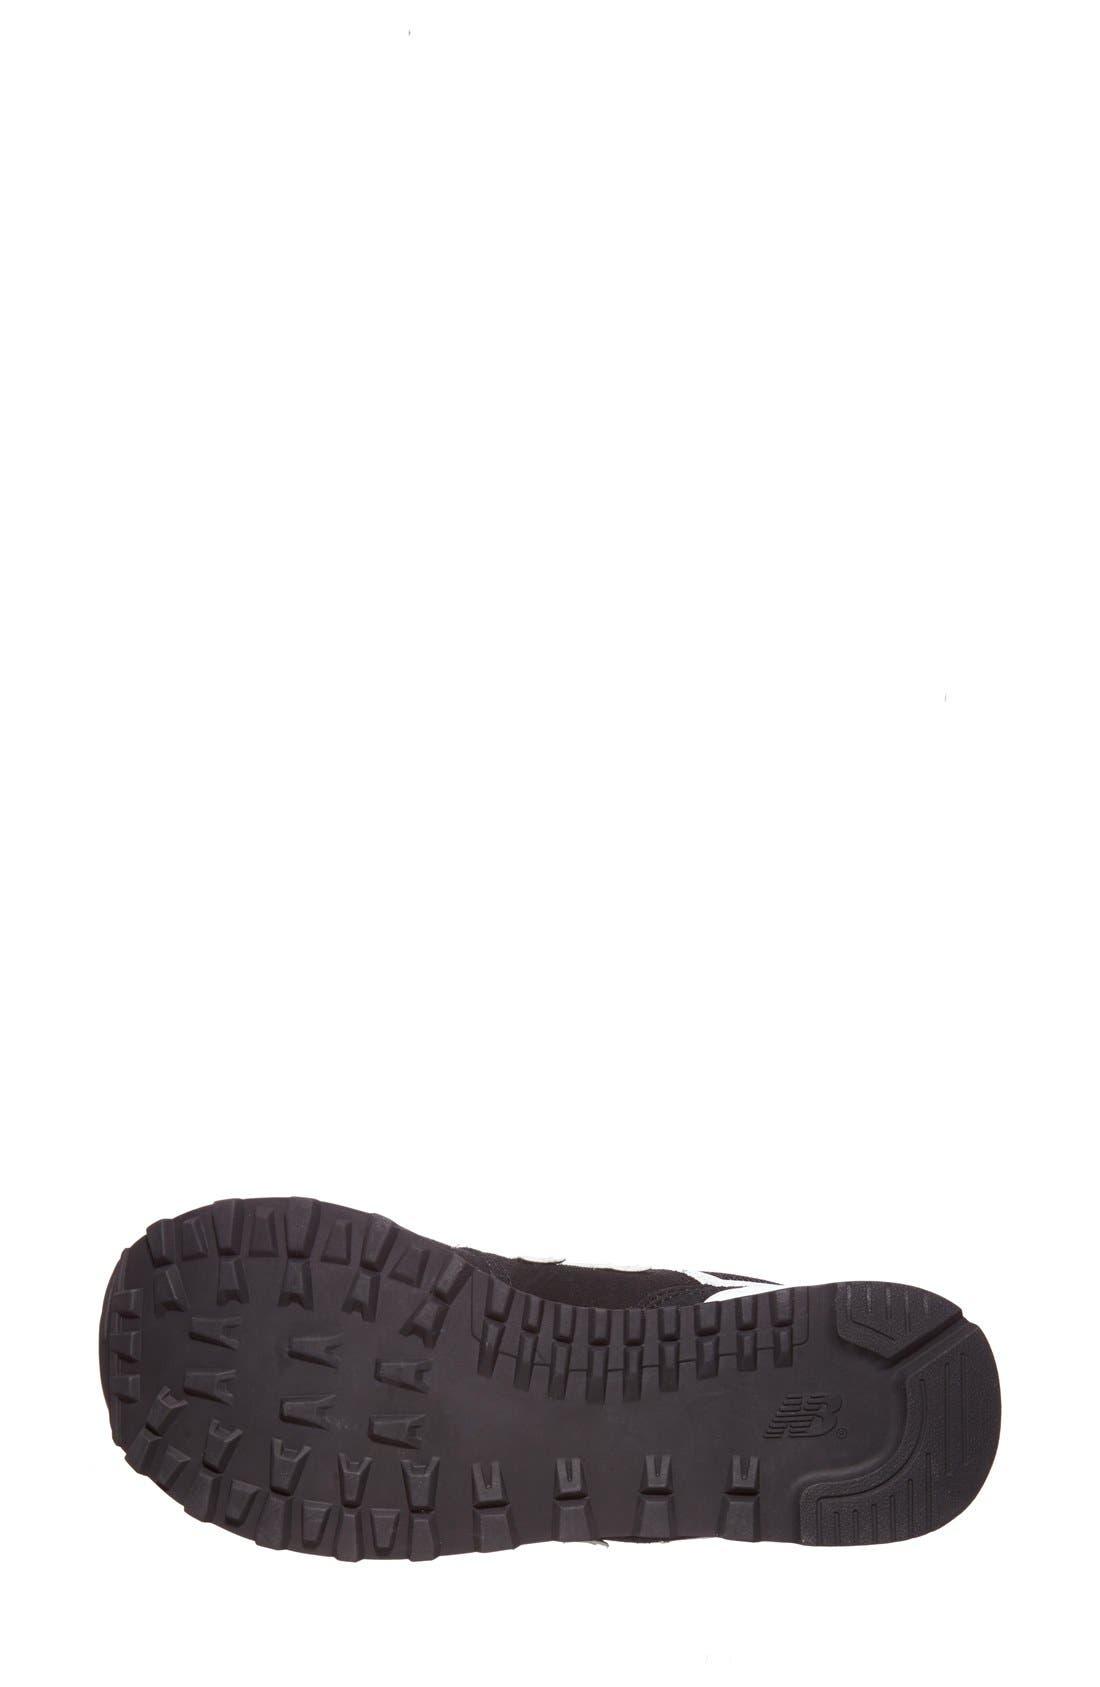 Alternate Image 4  - New Balance '574 Classic' Sneaker (Women)